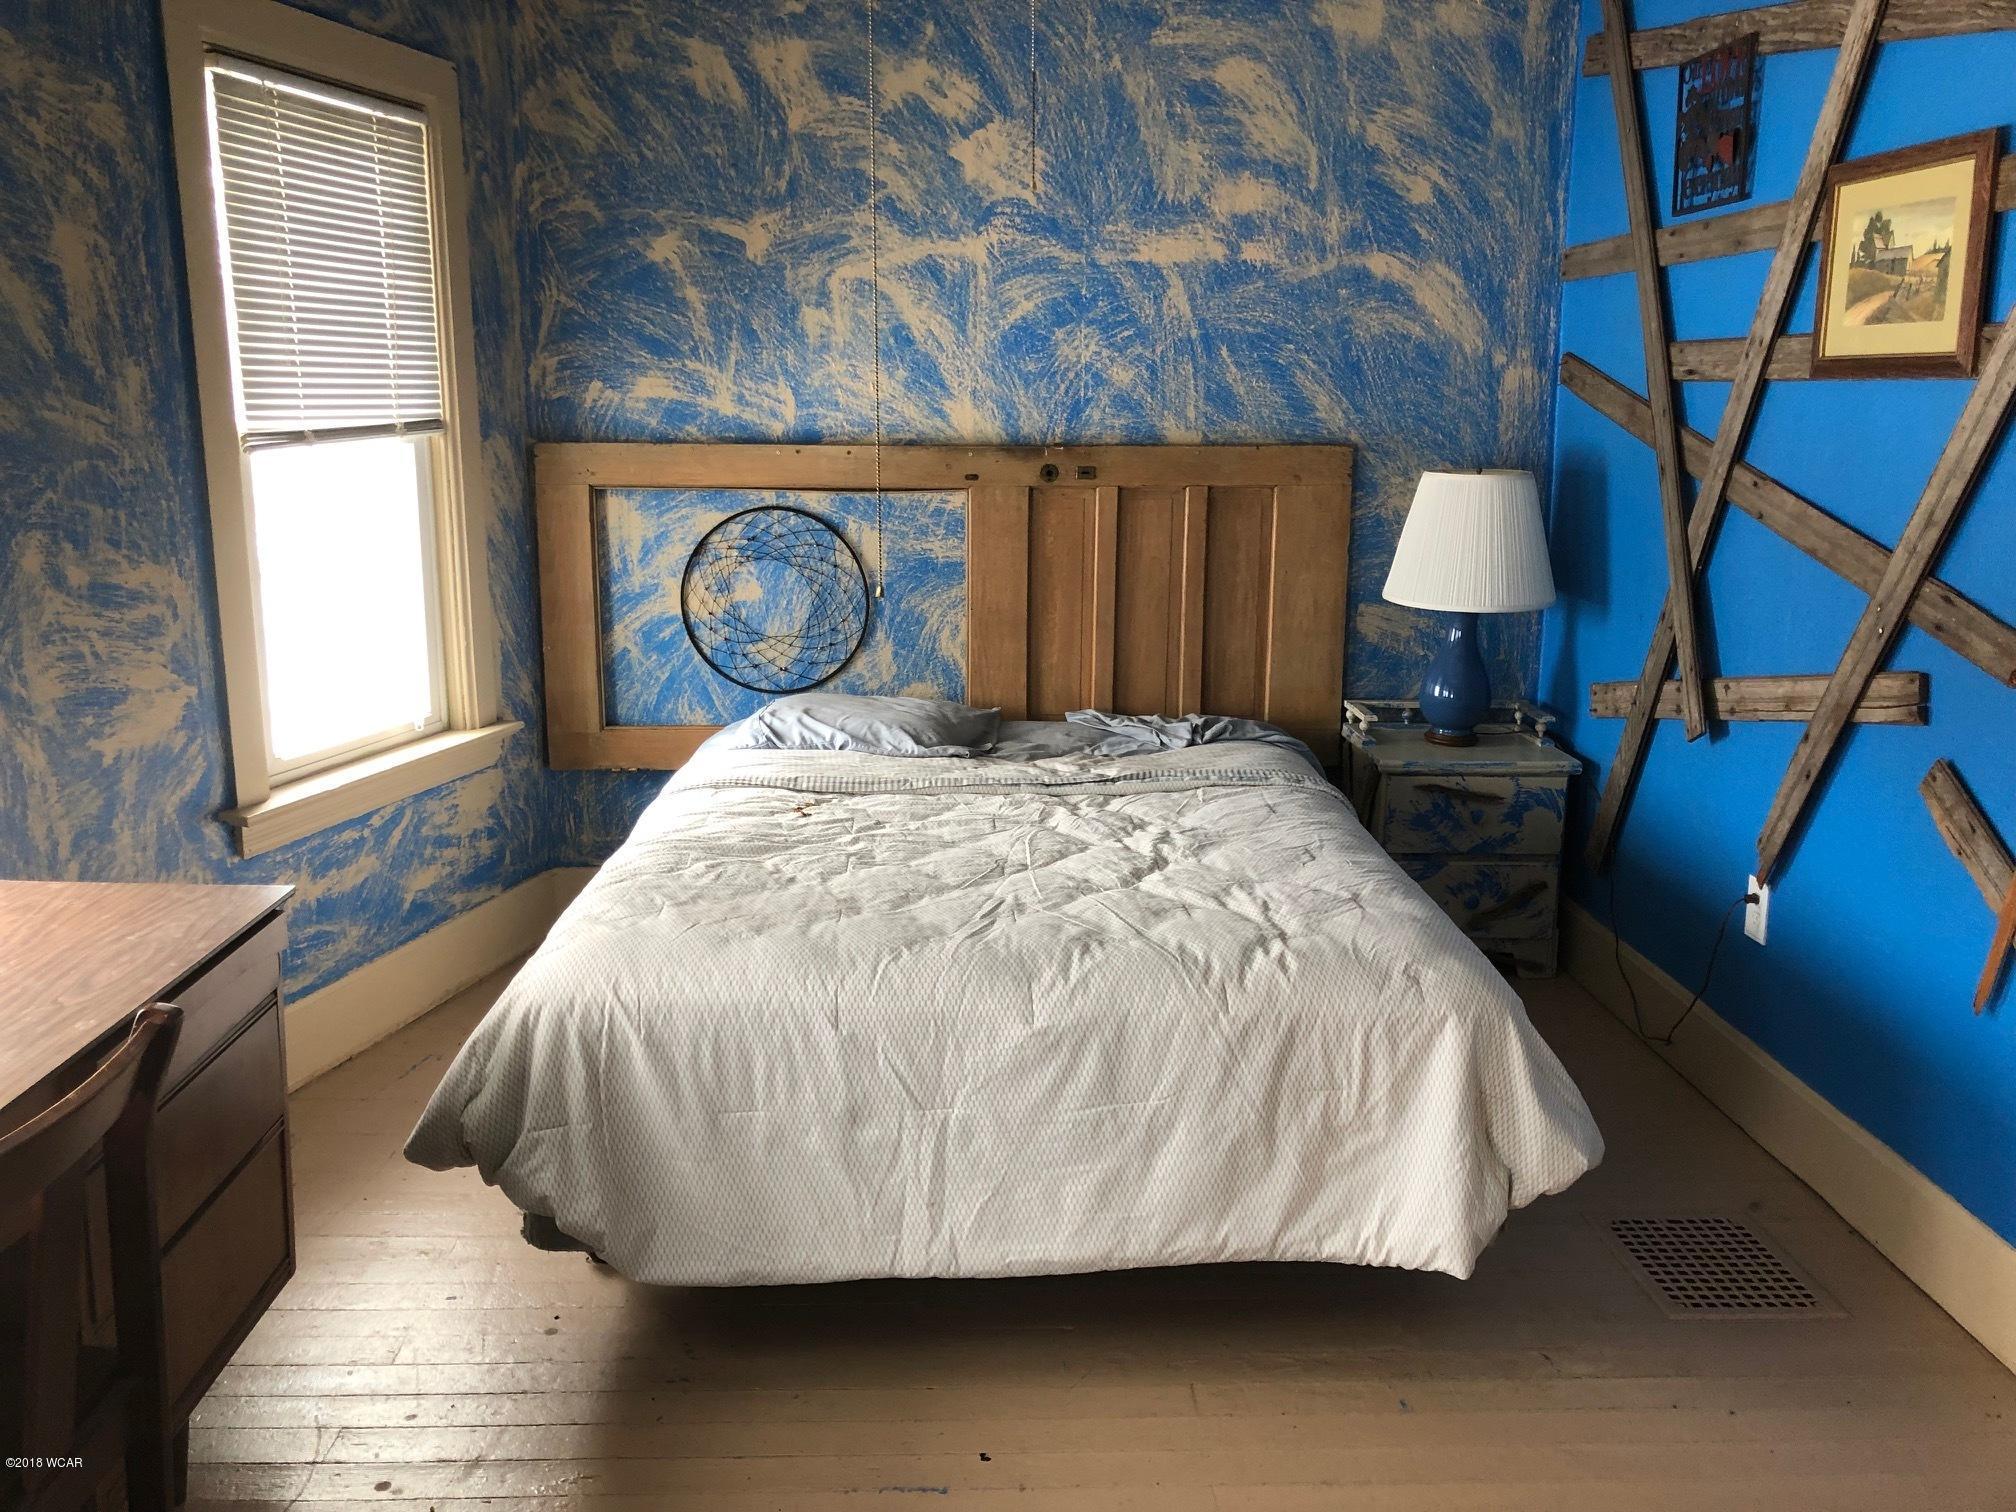 41605 640th Avenue,Franklin,3 Bedrooms Bedrooms,1 BathroomBathrooms,Single Family,640th Avenue,6033117